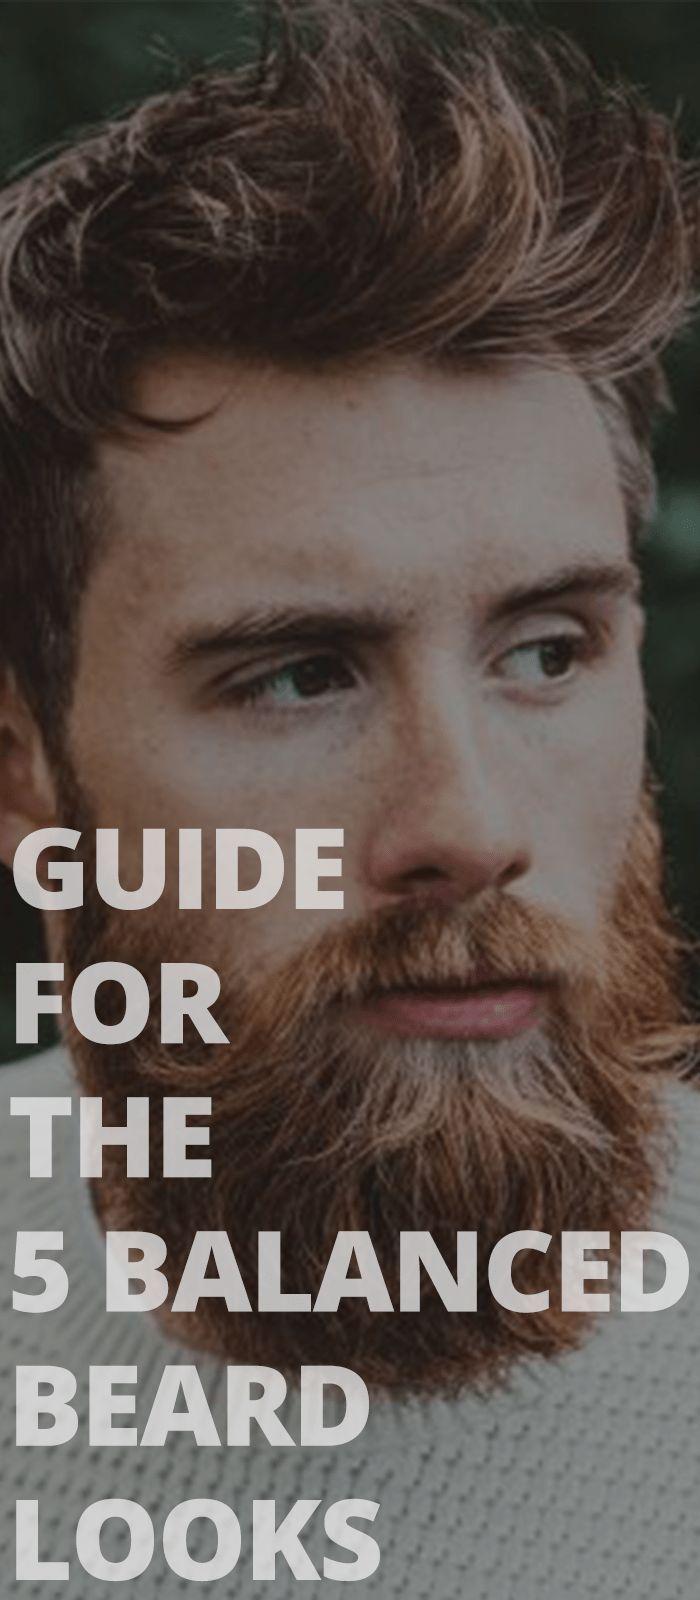 Guide For The 5 Balanced Beard Looks